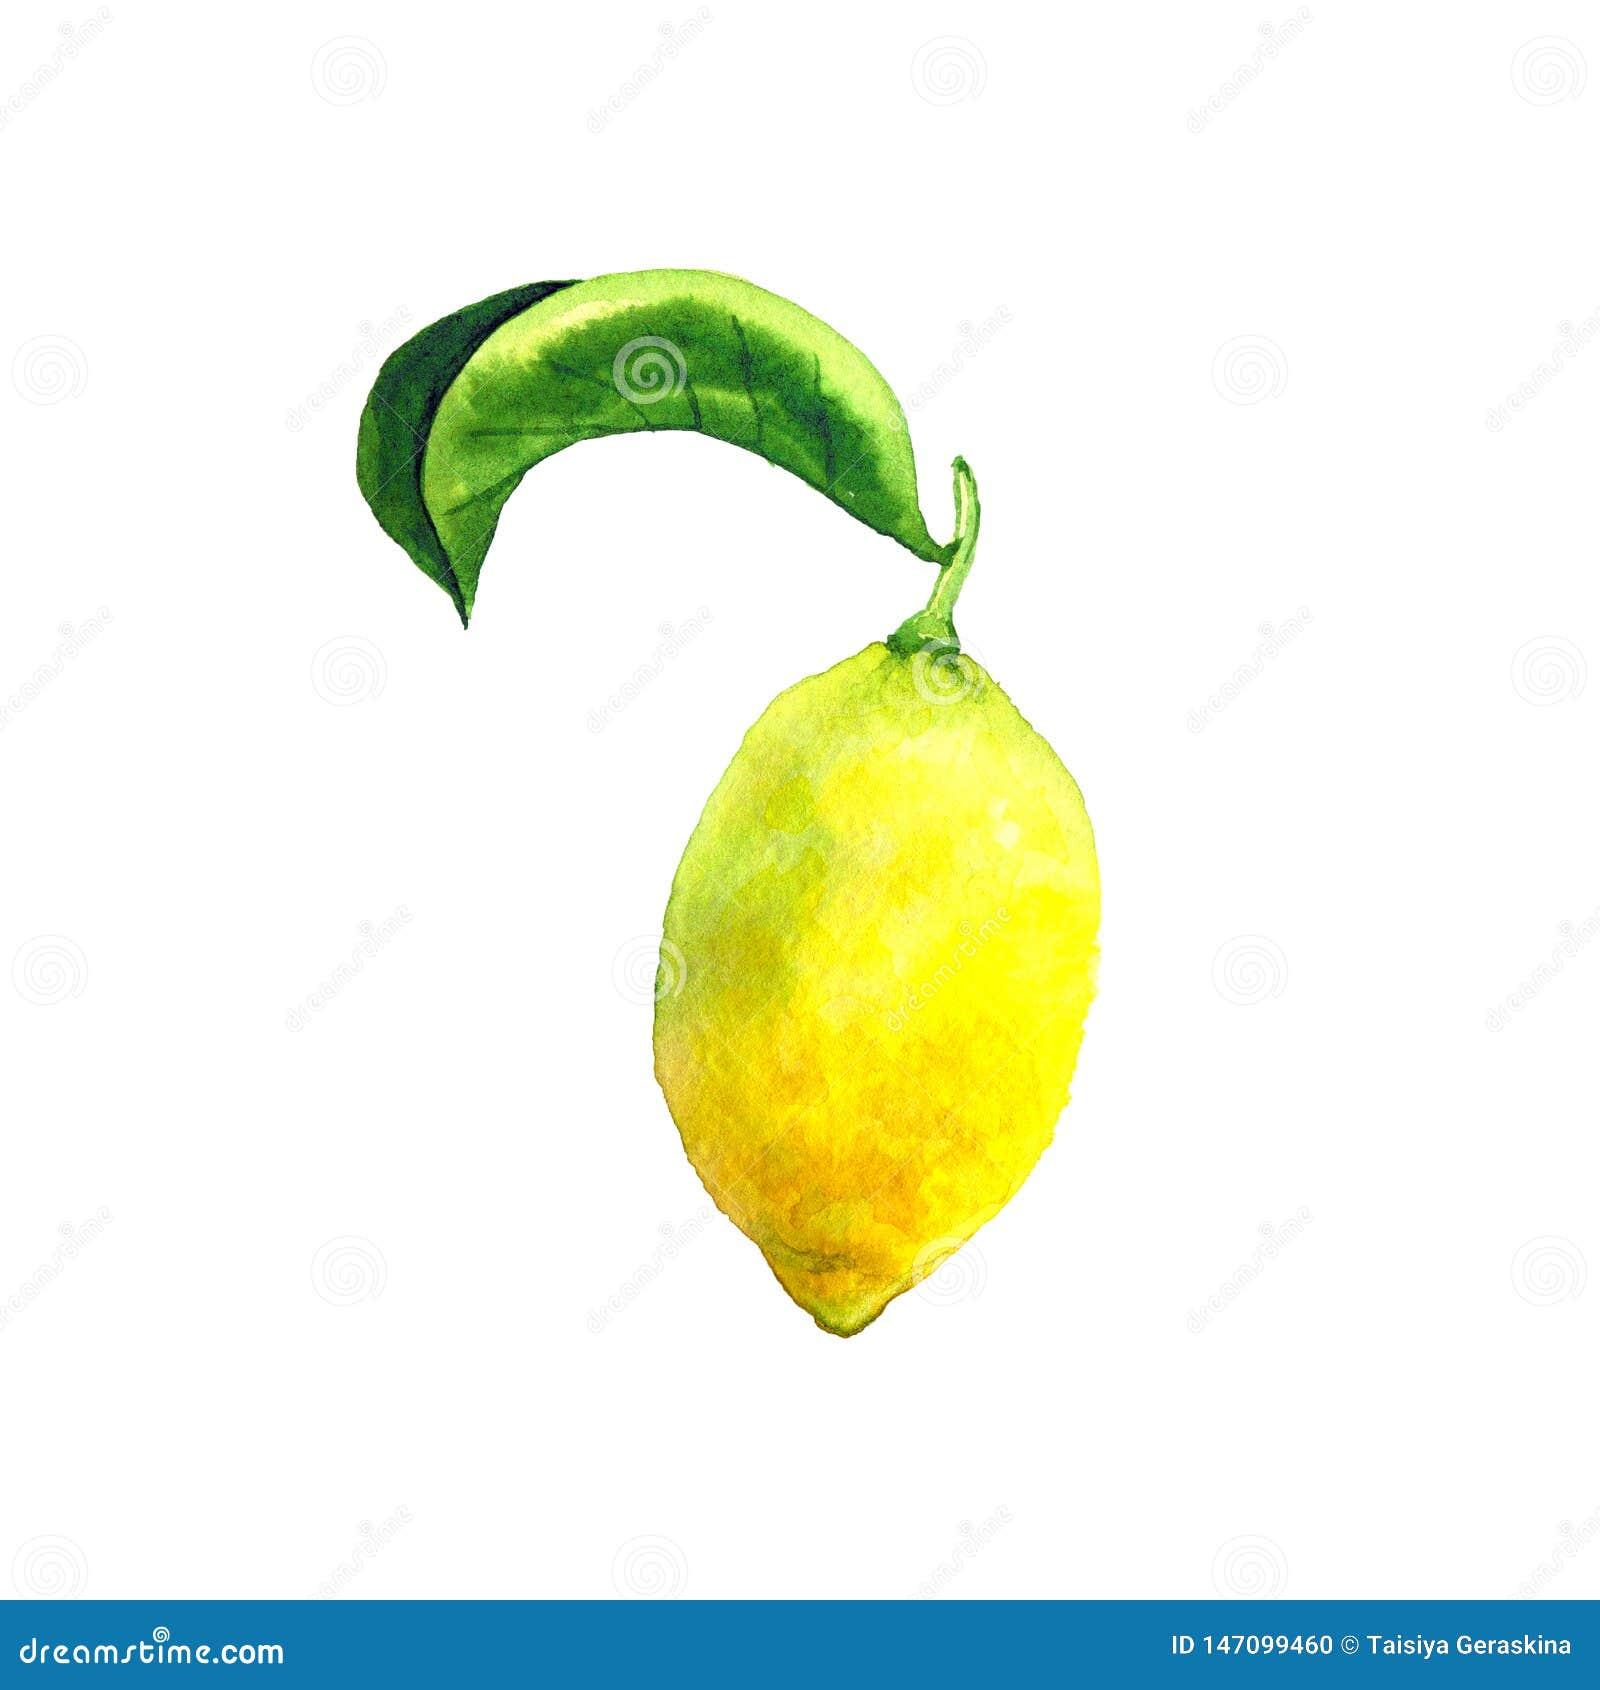 Gr?n leafcitron Ljus gul frukt Botanisk best?ndsdel f?r design Hand dragen vattenf?rgillustration Isolerat p? vit